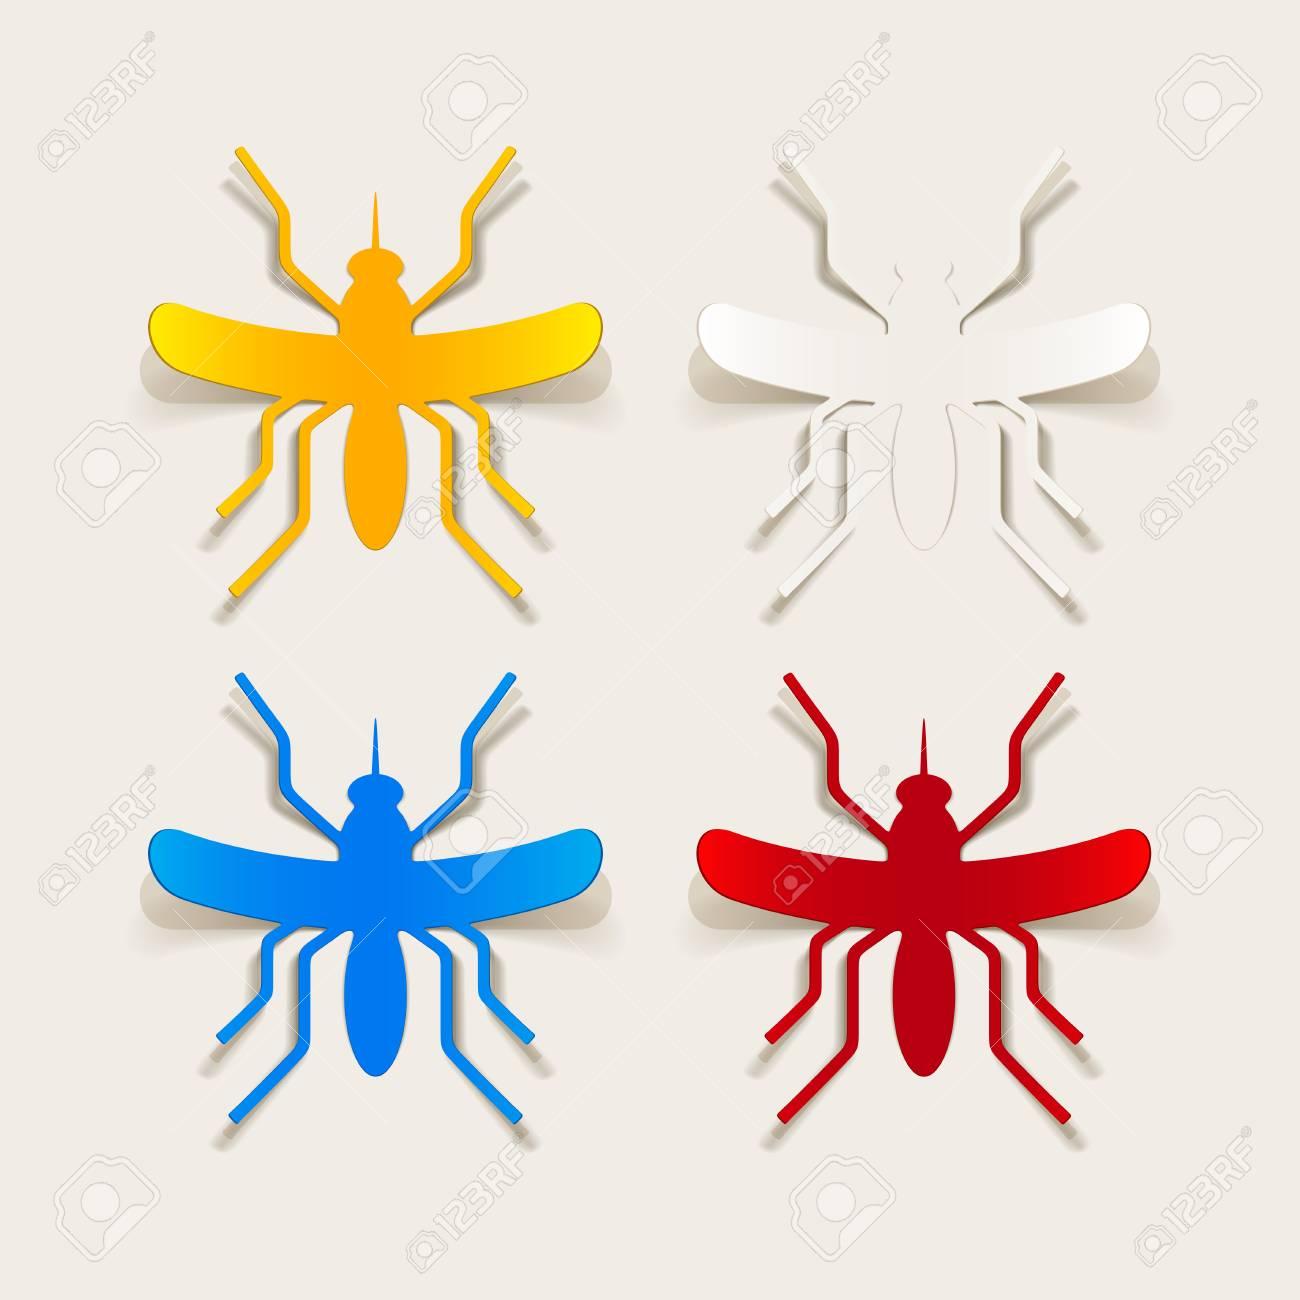 realistic design element: mosquito Stock Vector - 25627585